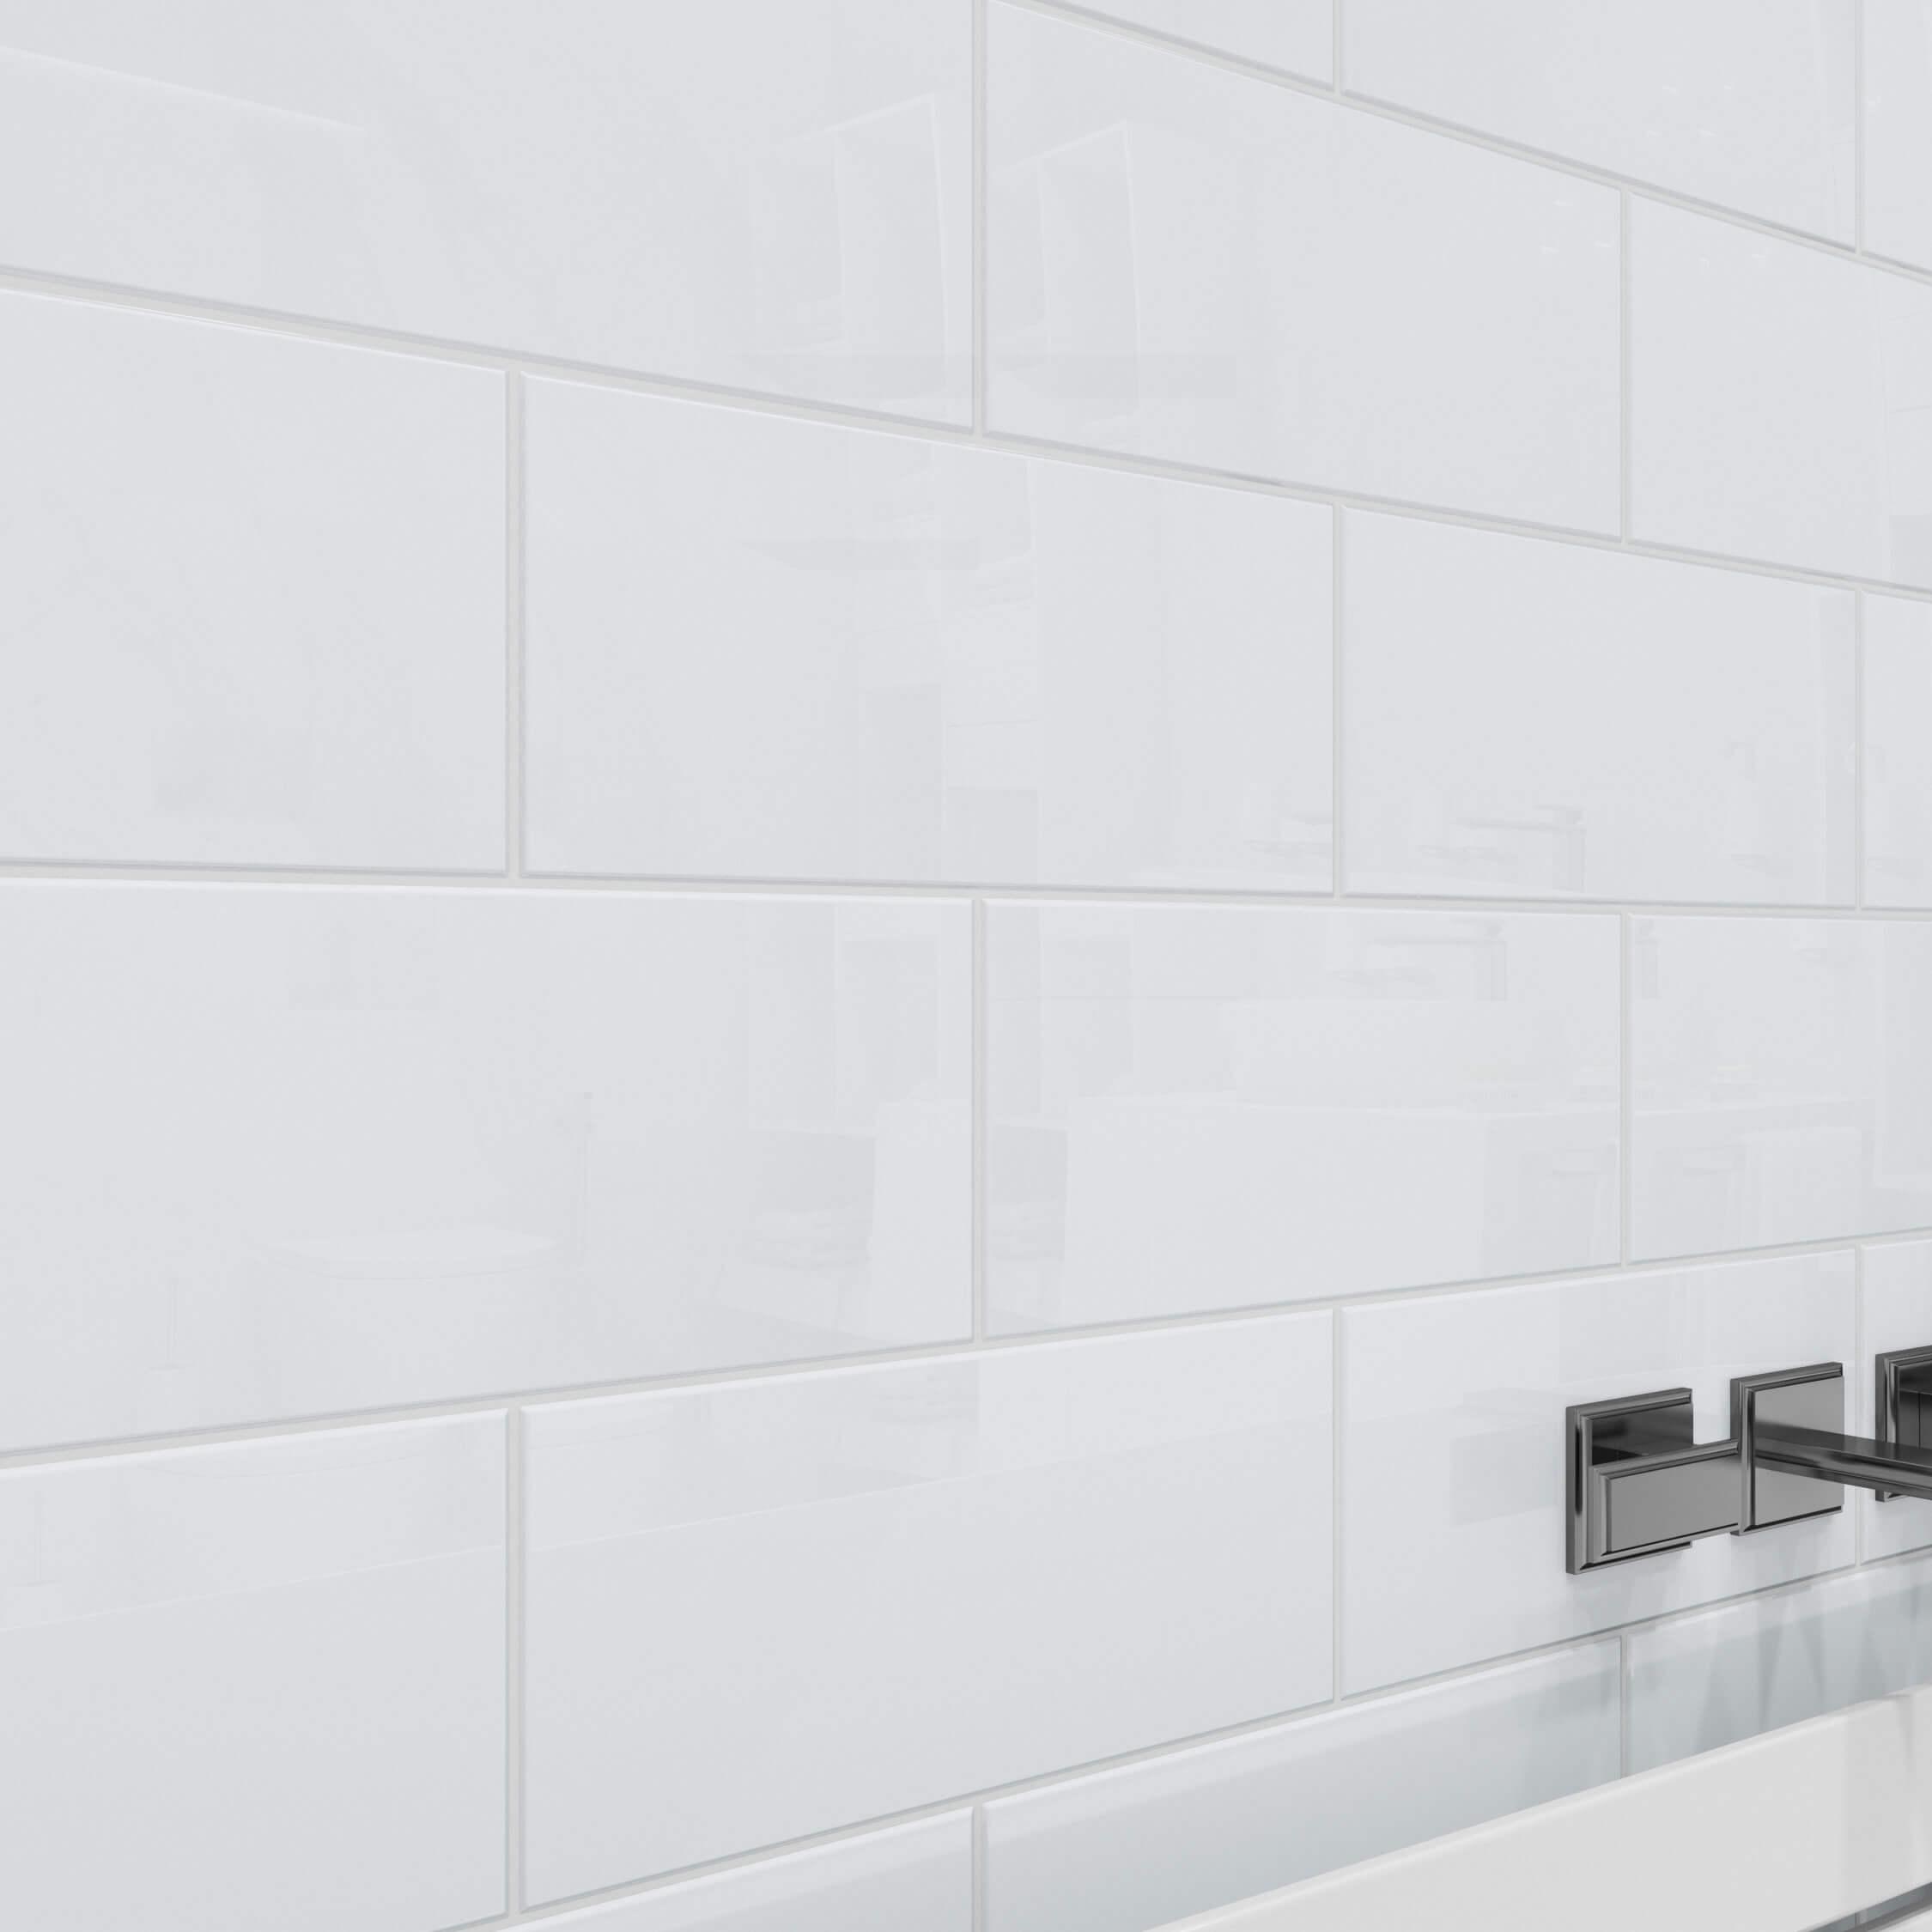 Giorbello Tile in use